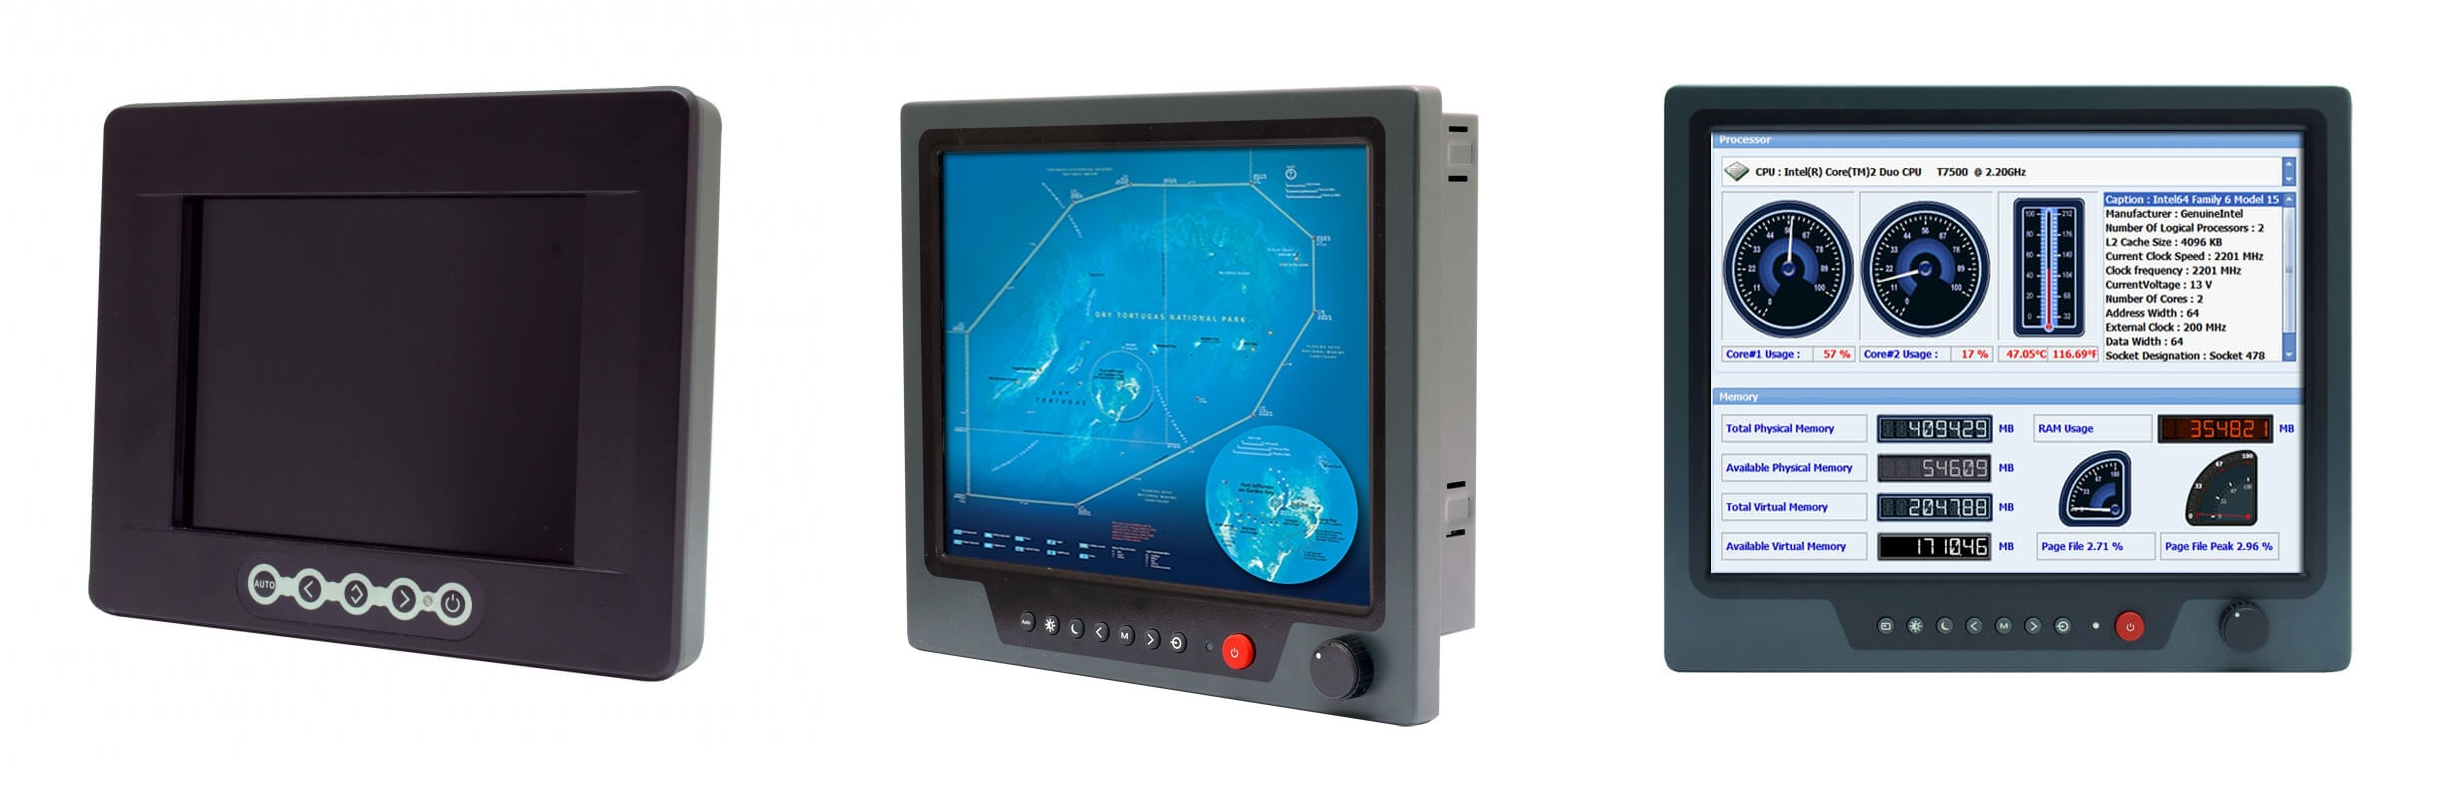 cds marine monitor range